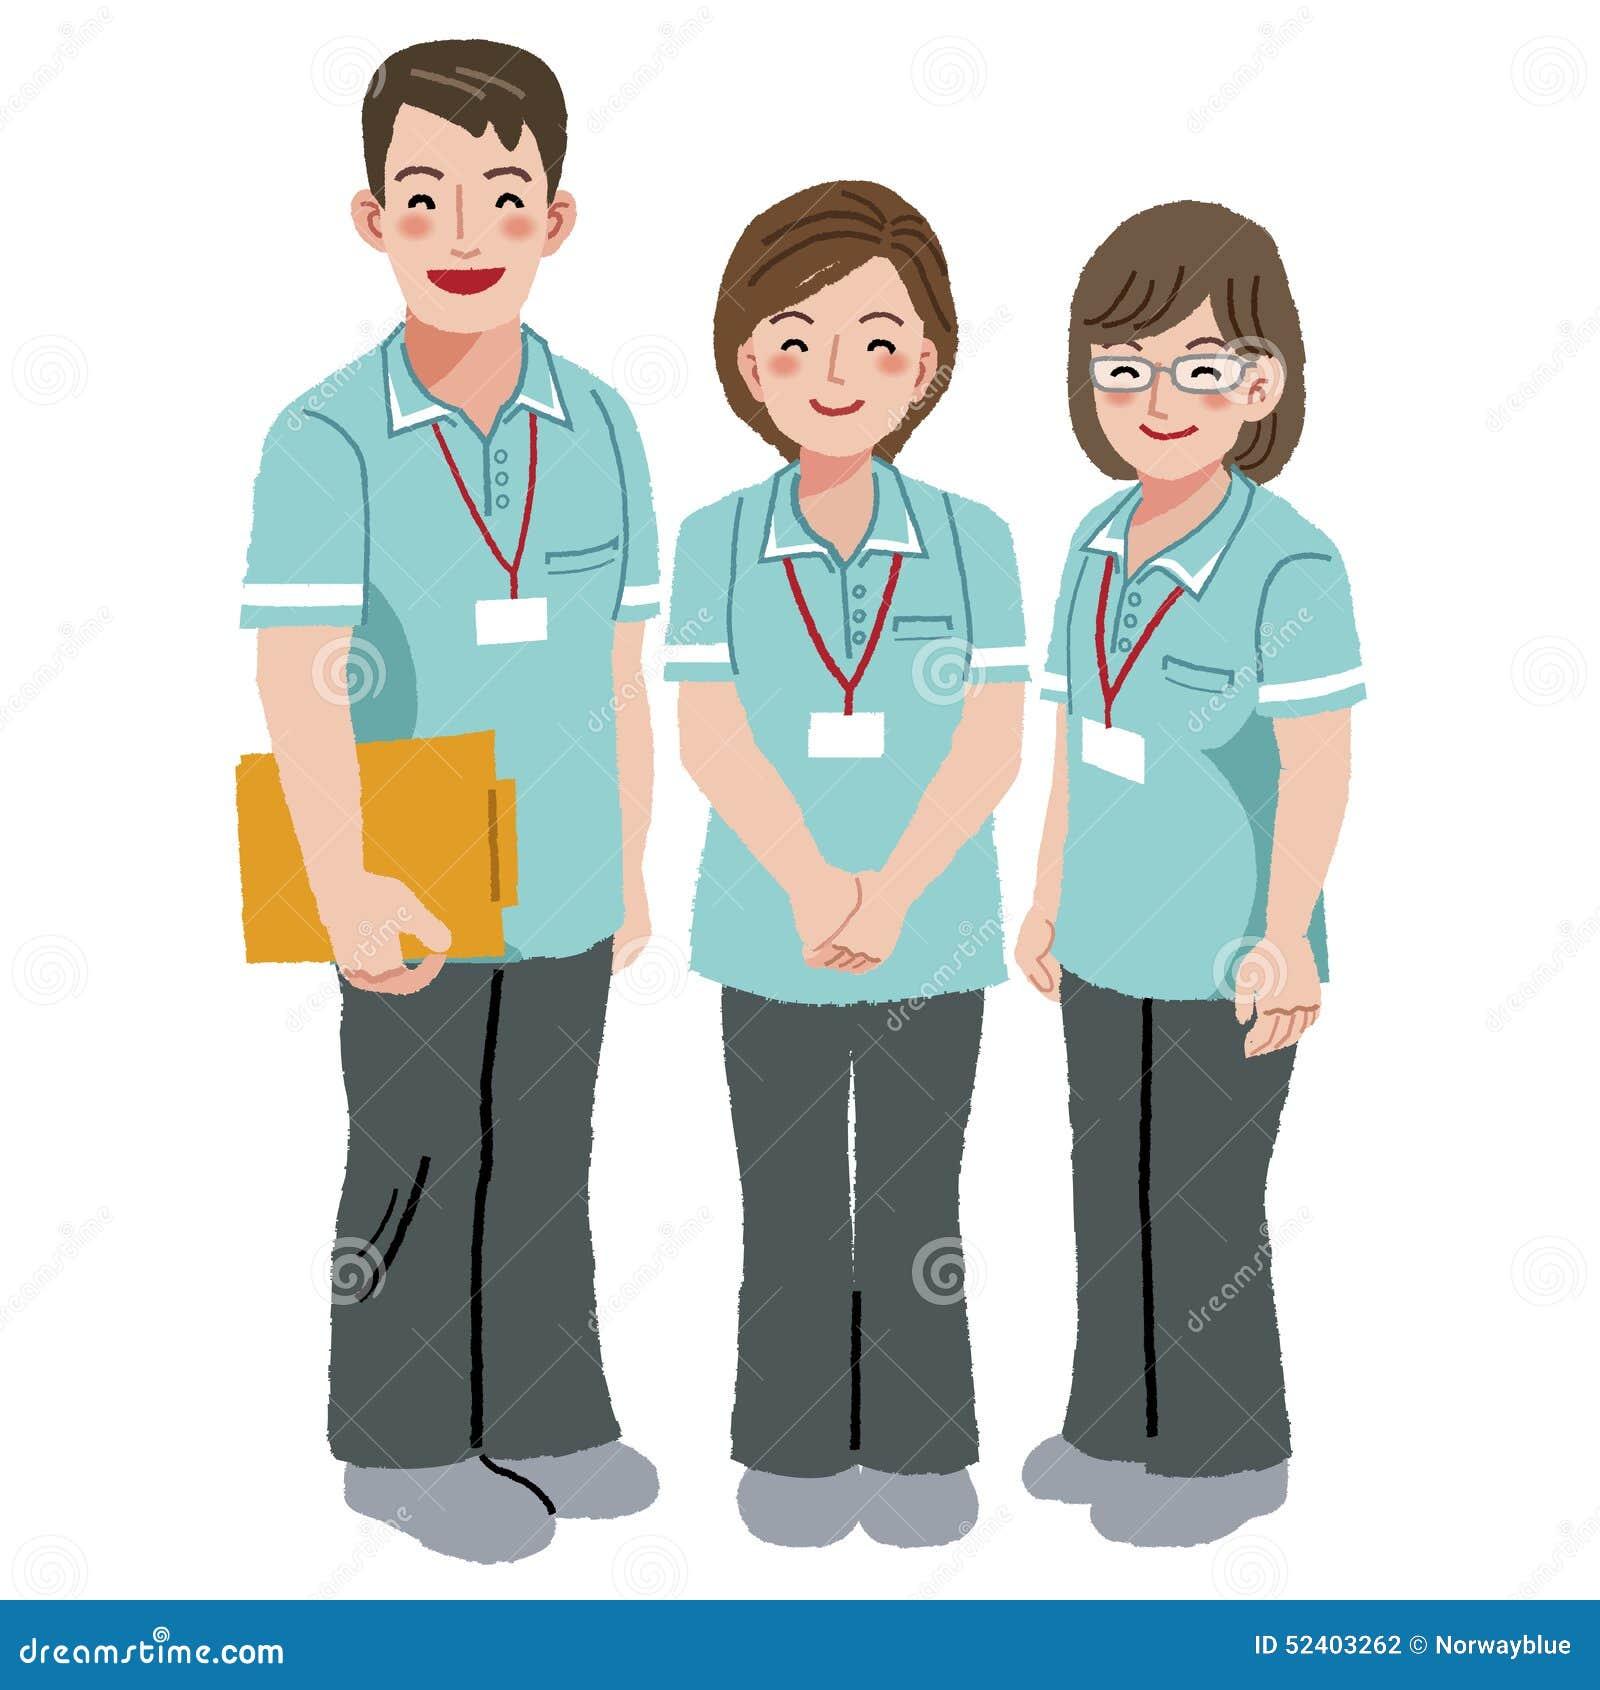 caregiver cartoons illustrations amp vector stock images